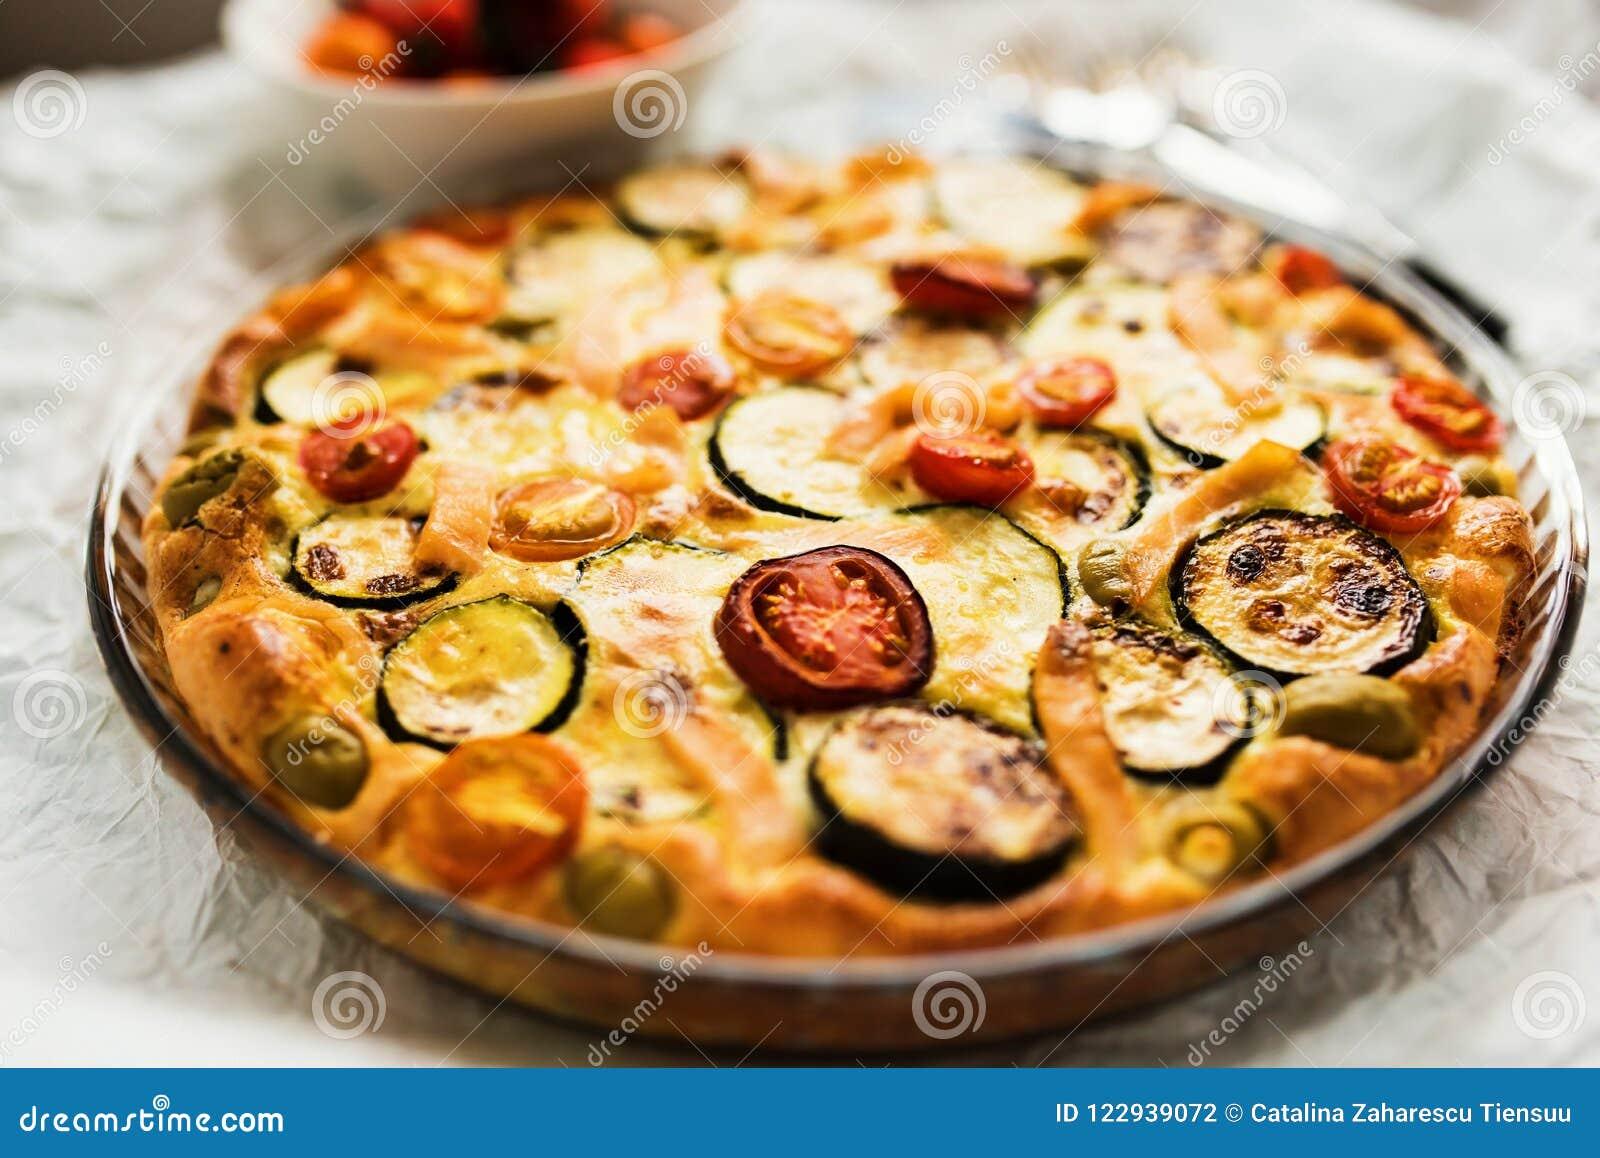 Close-up of Zucchini, tomatoes and cheese tart